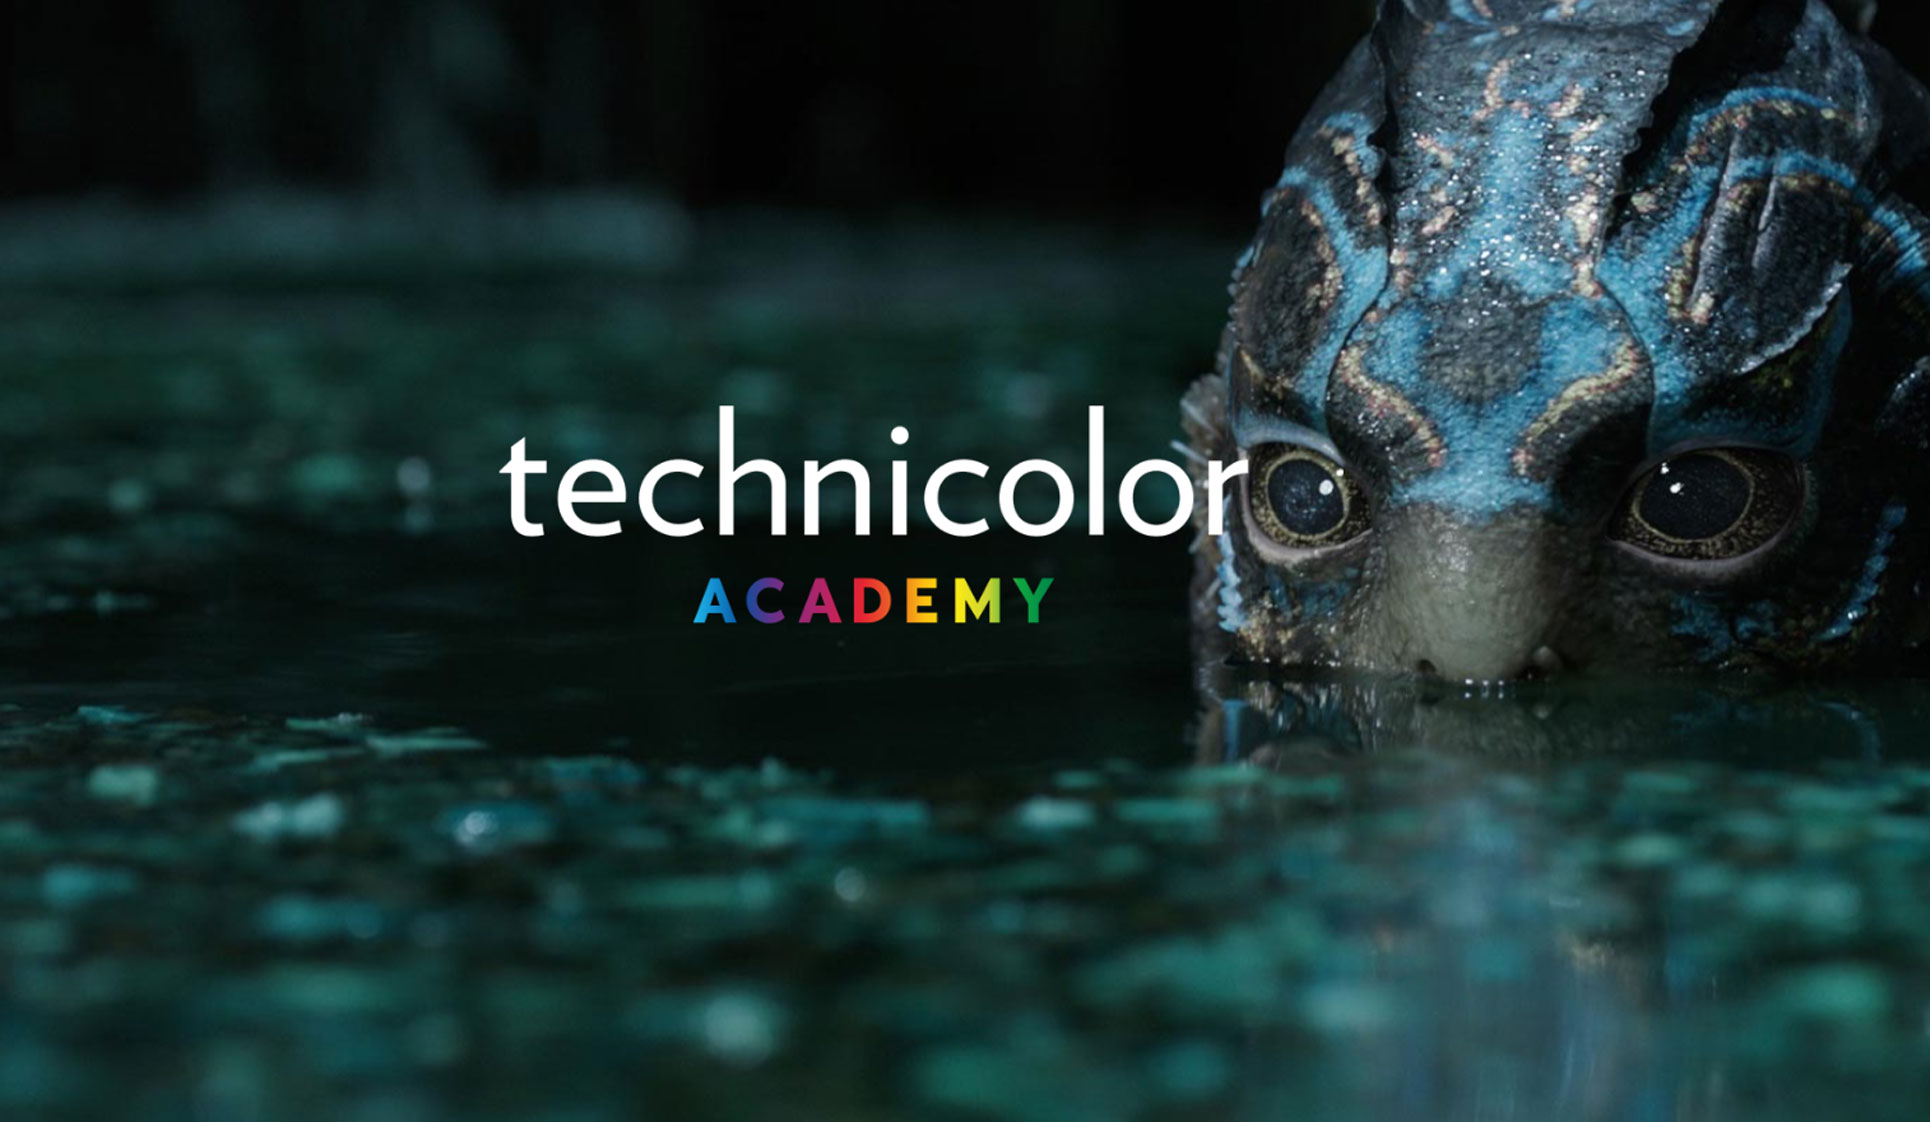 technicolor s jonathan fletcher describes talent development